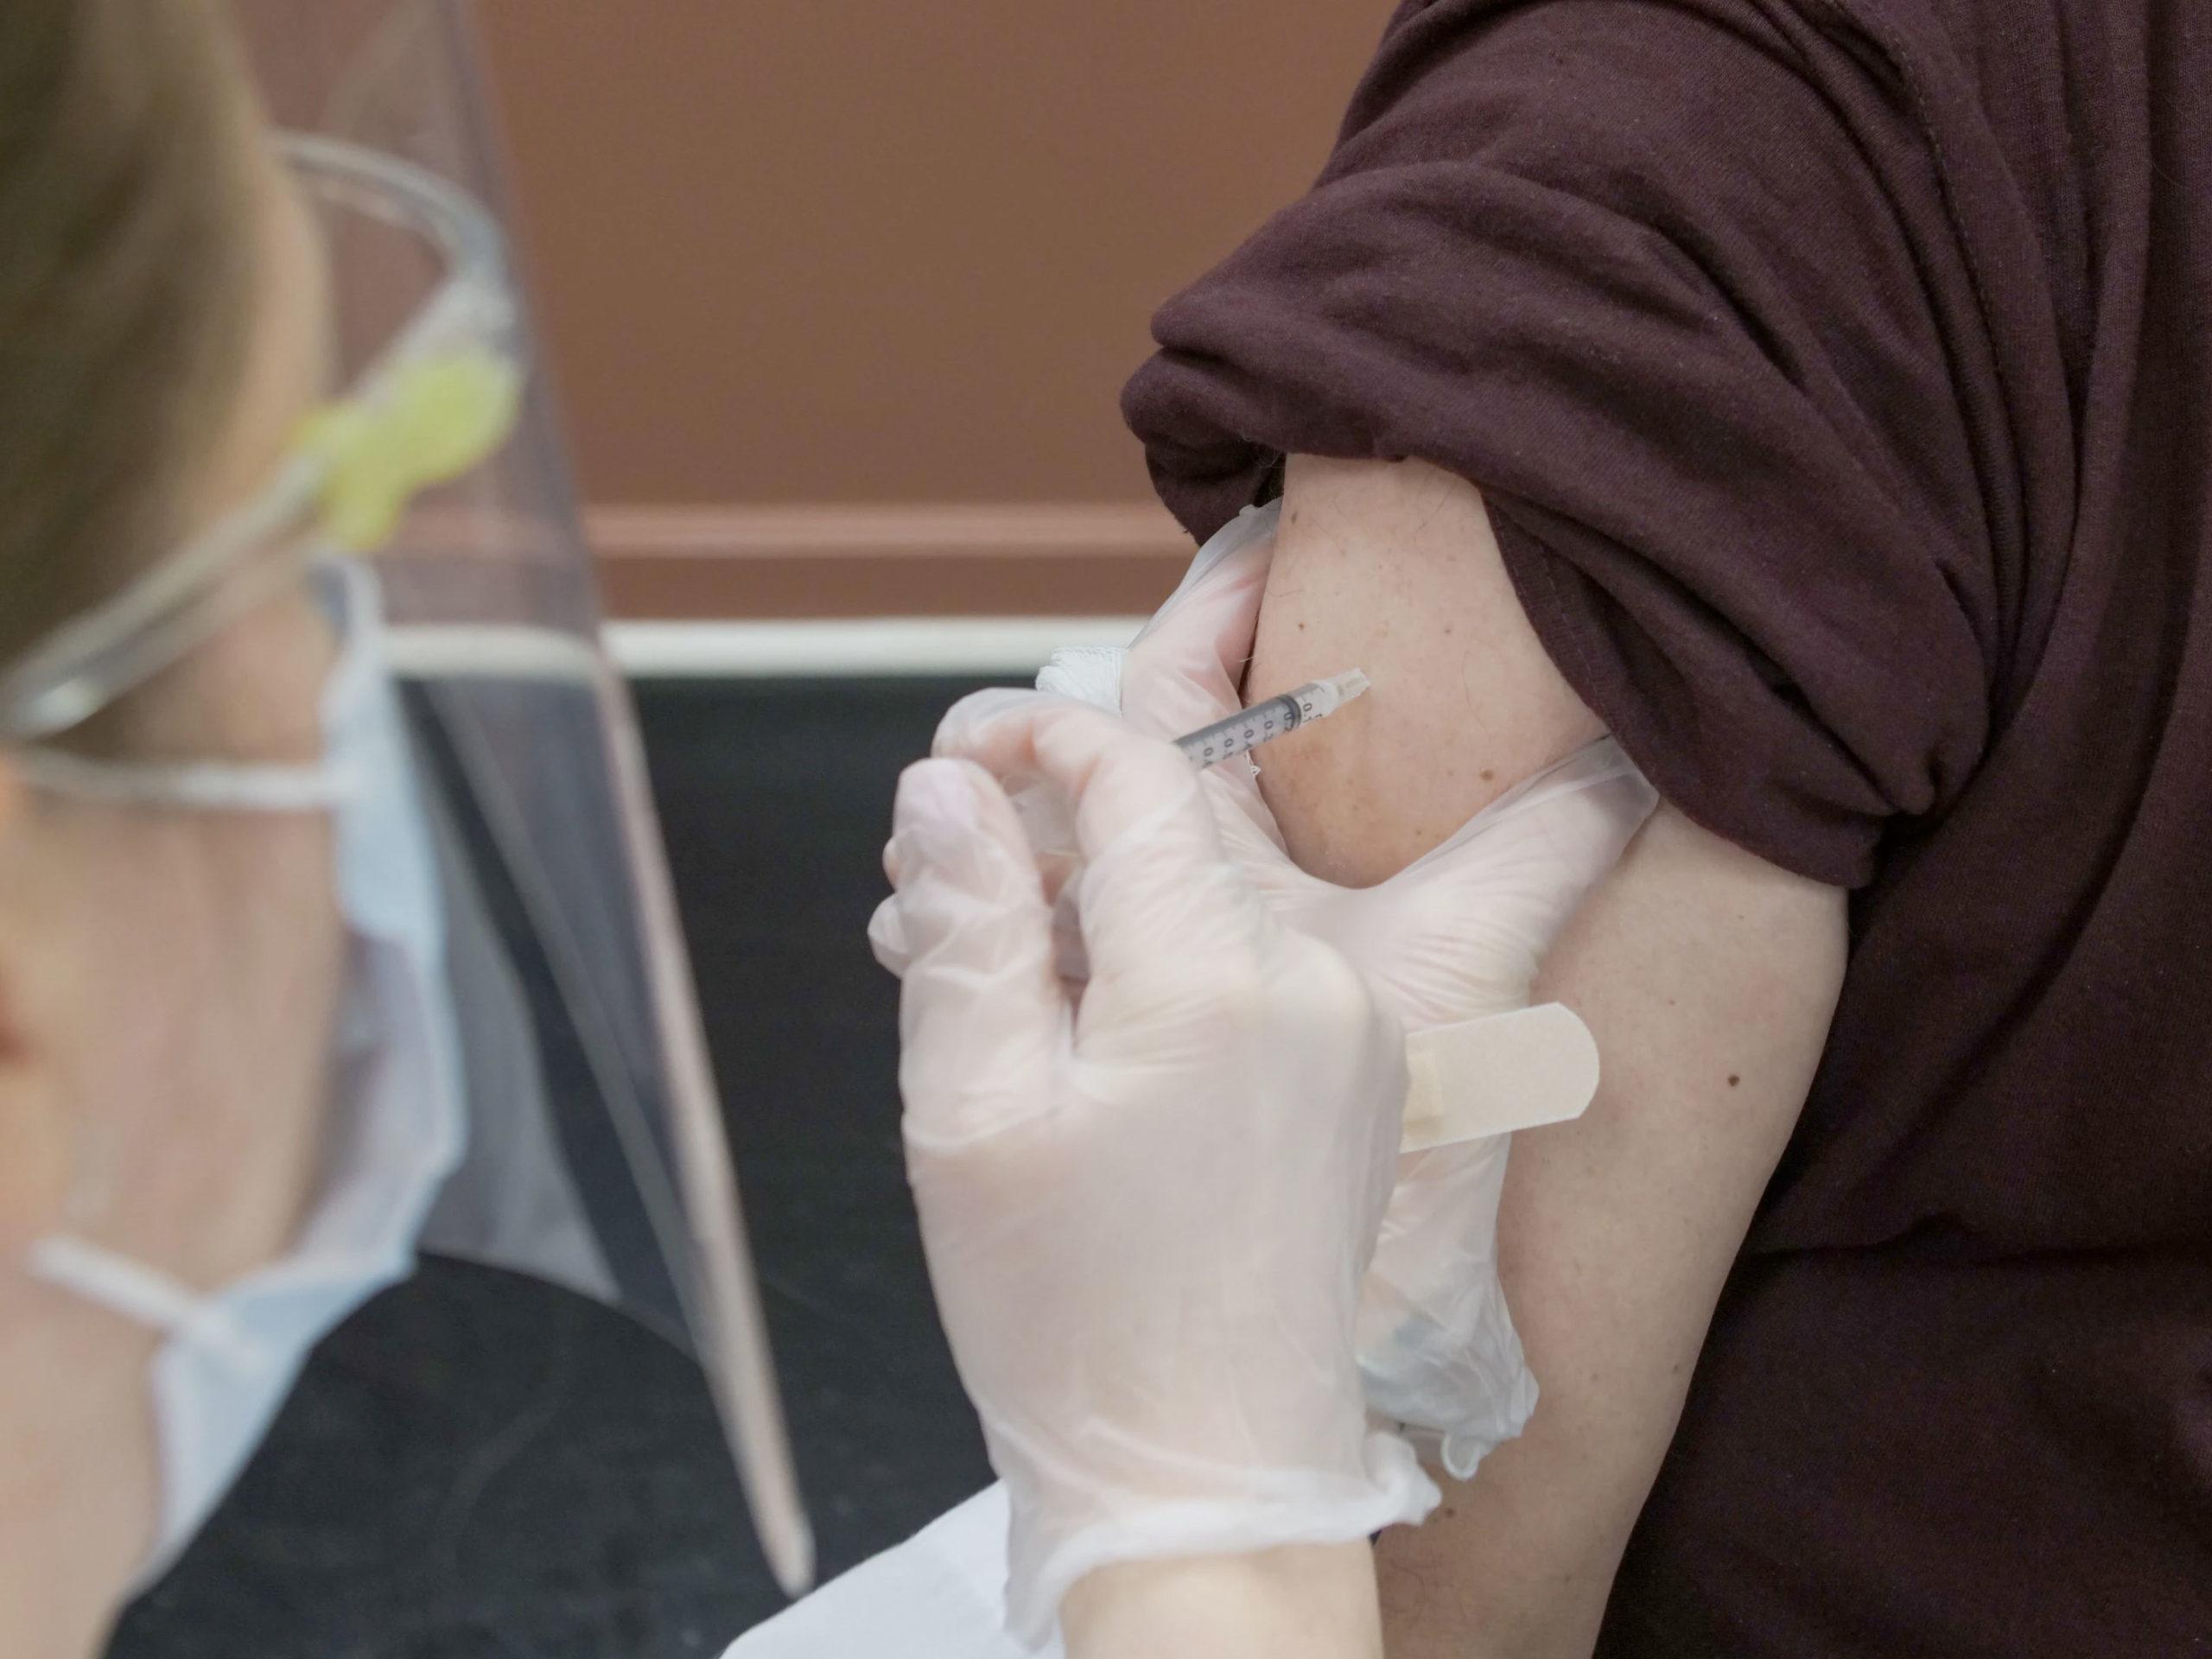 Praxis-Dr-Cassens-Luedinghausen-Impfung-2